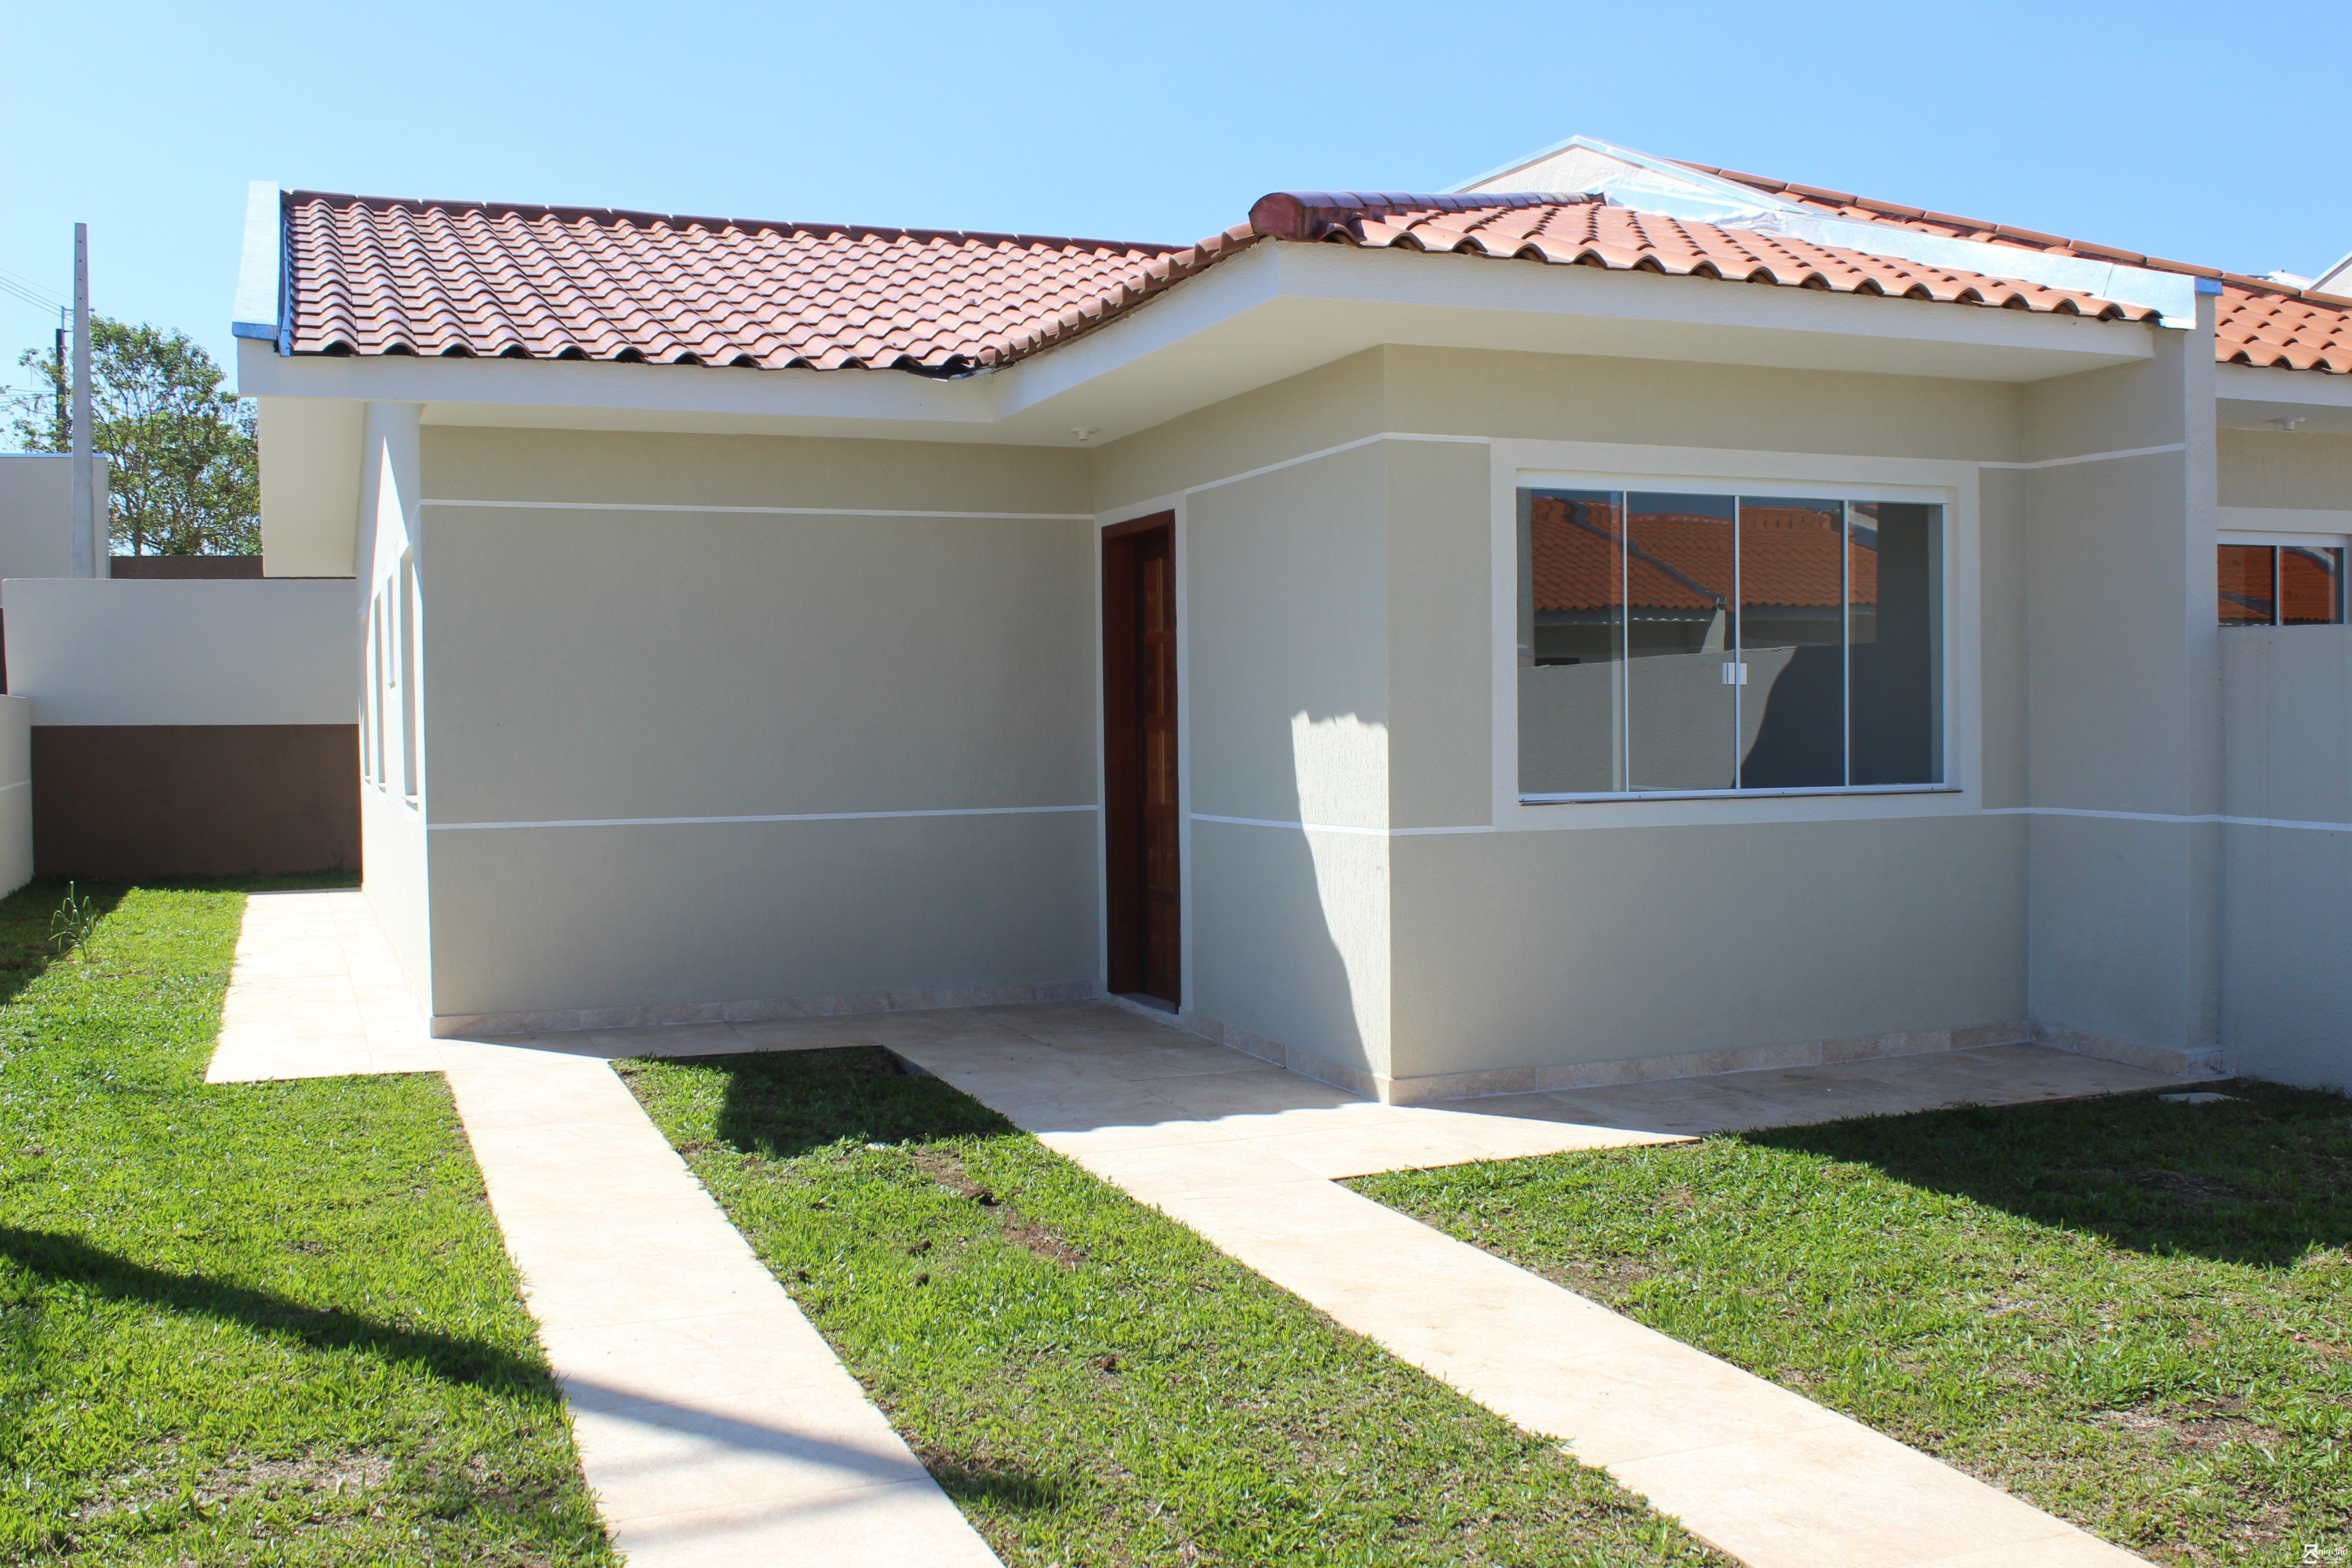 REF. 8365 -  Sao Jose Dos Pinhais - Rua  Sao Maximiliano Maria Kolbe, 340 - Casa 3